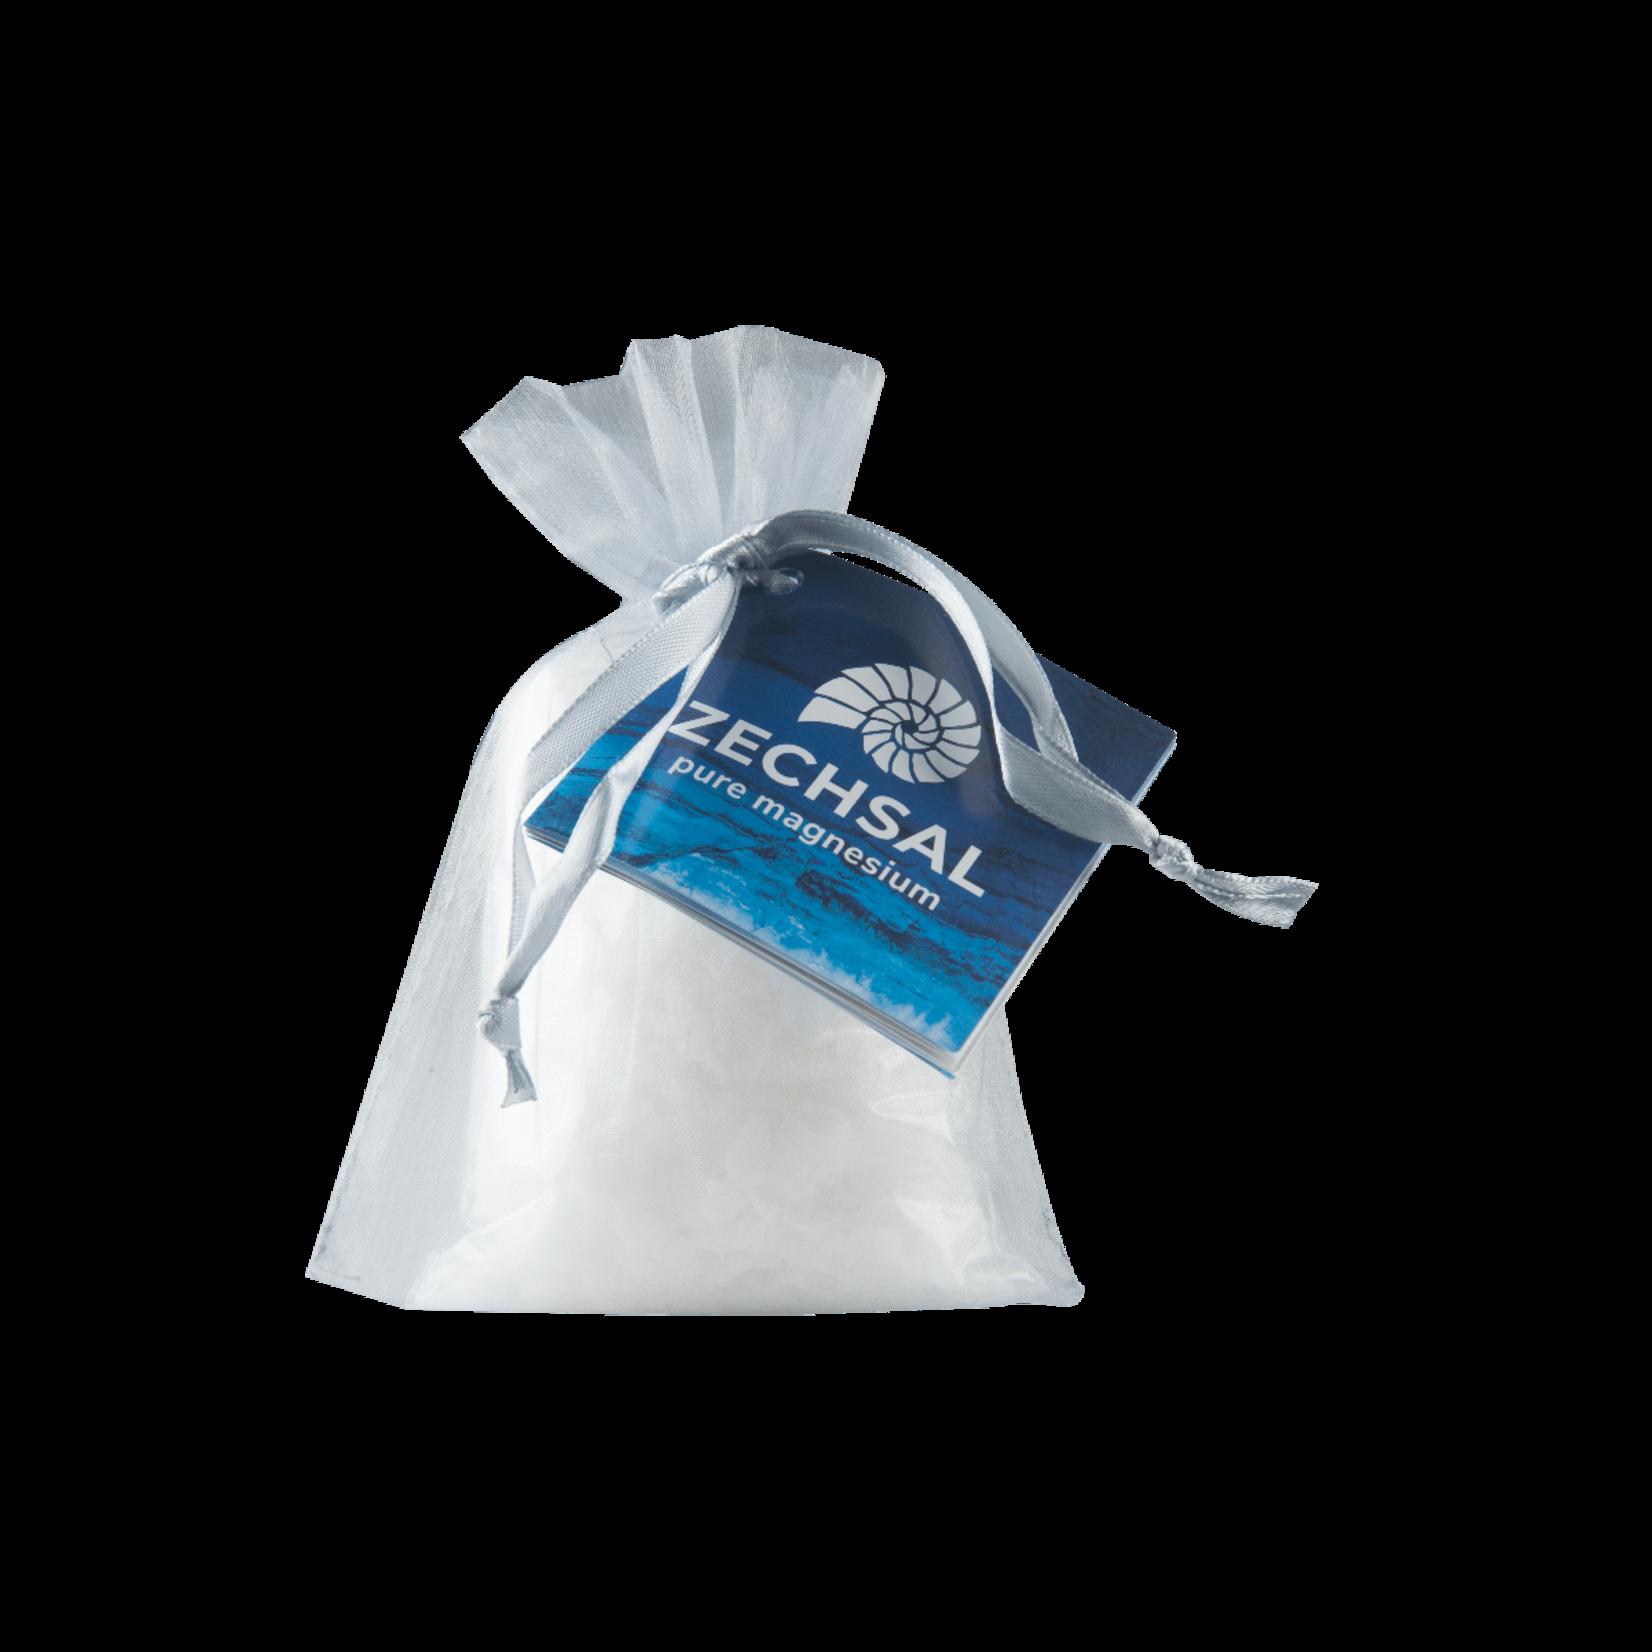 Zechsal Zechsal magnesium geschenkverpakking voetbad 125g